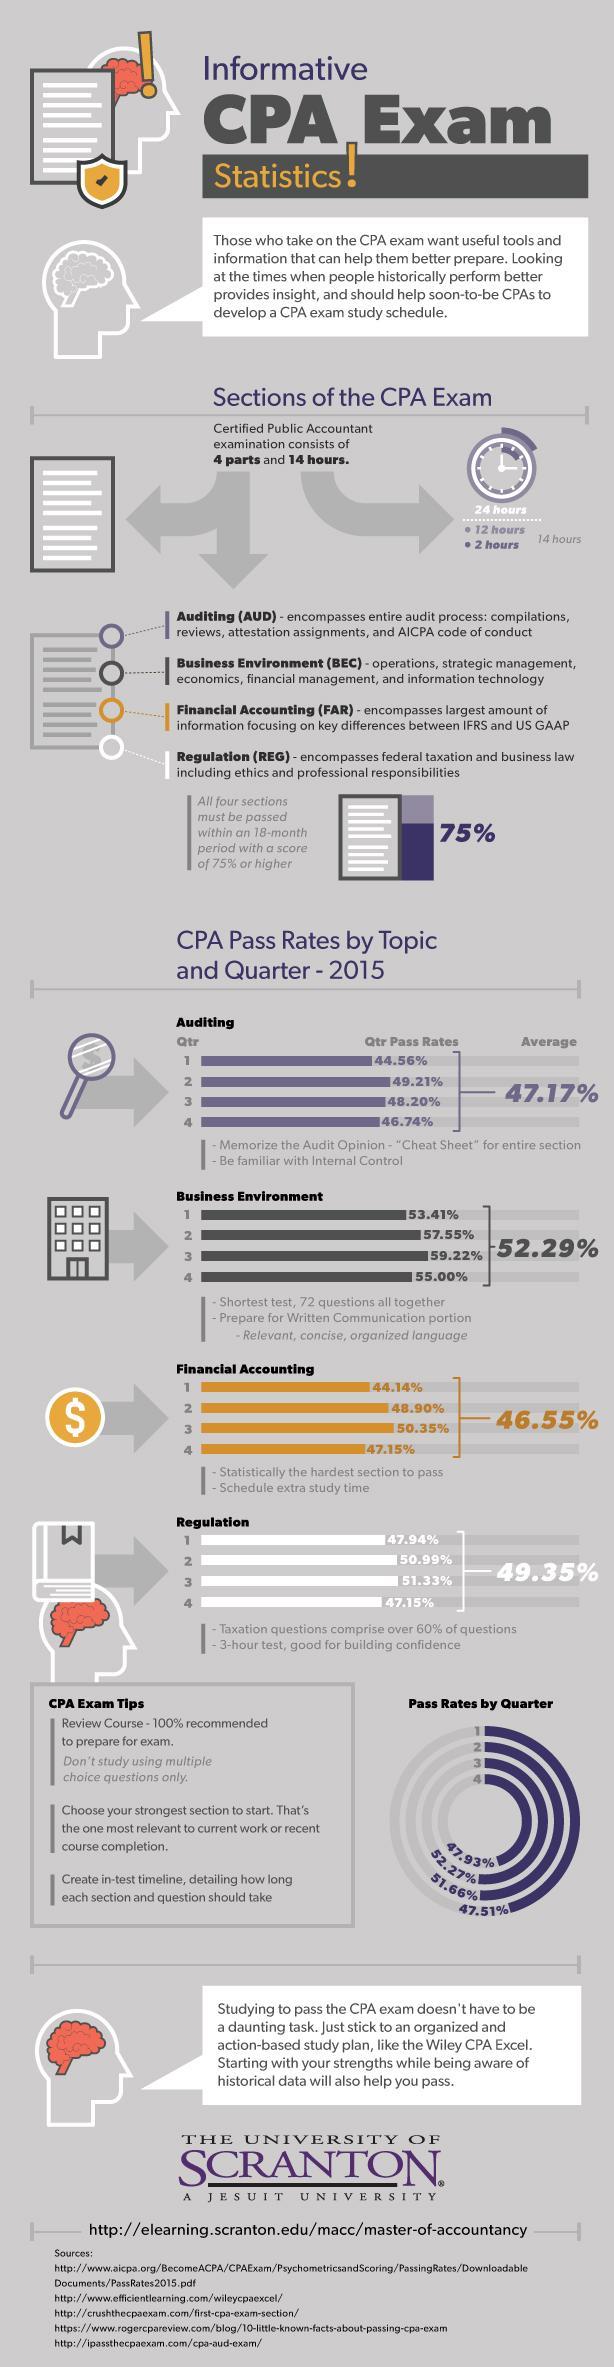 CPA Exam Statistics Infographic